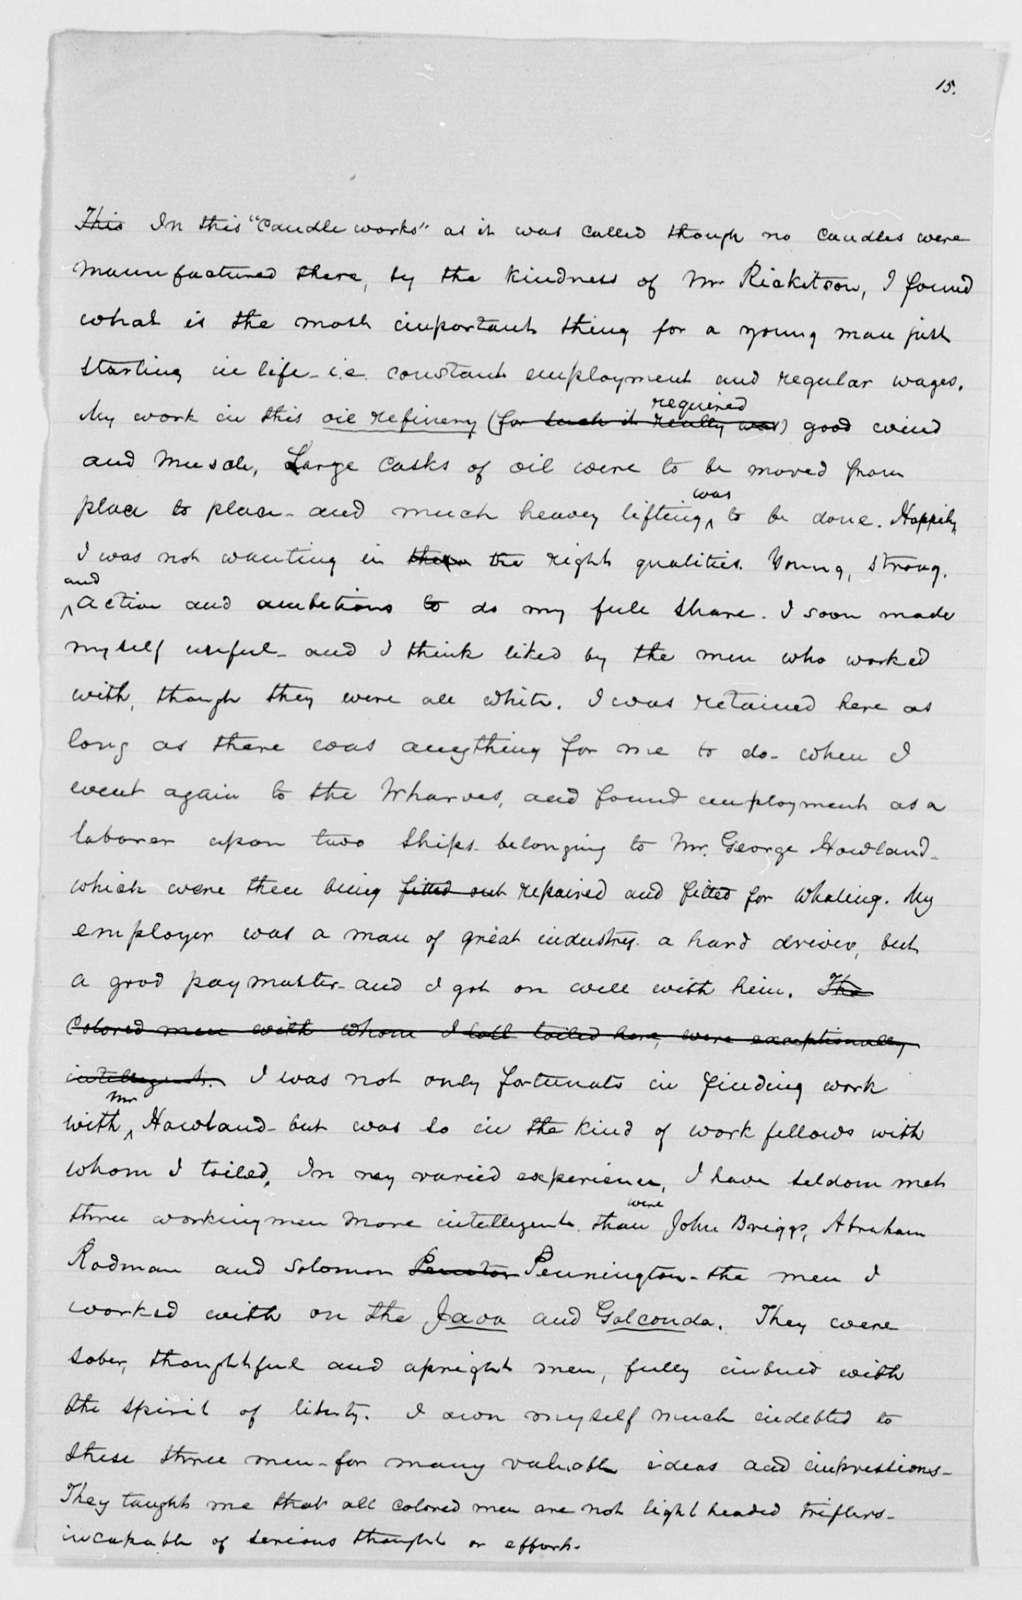 Drafts of Douglass' Autobiography - p. 261